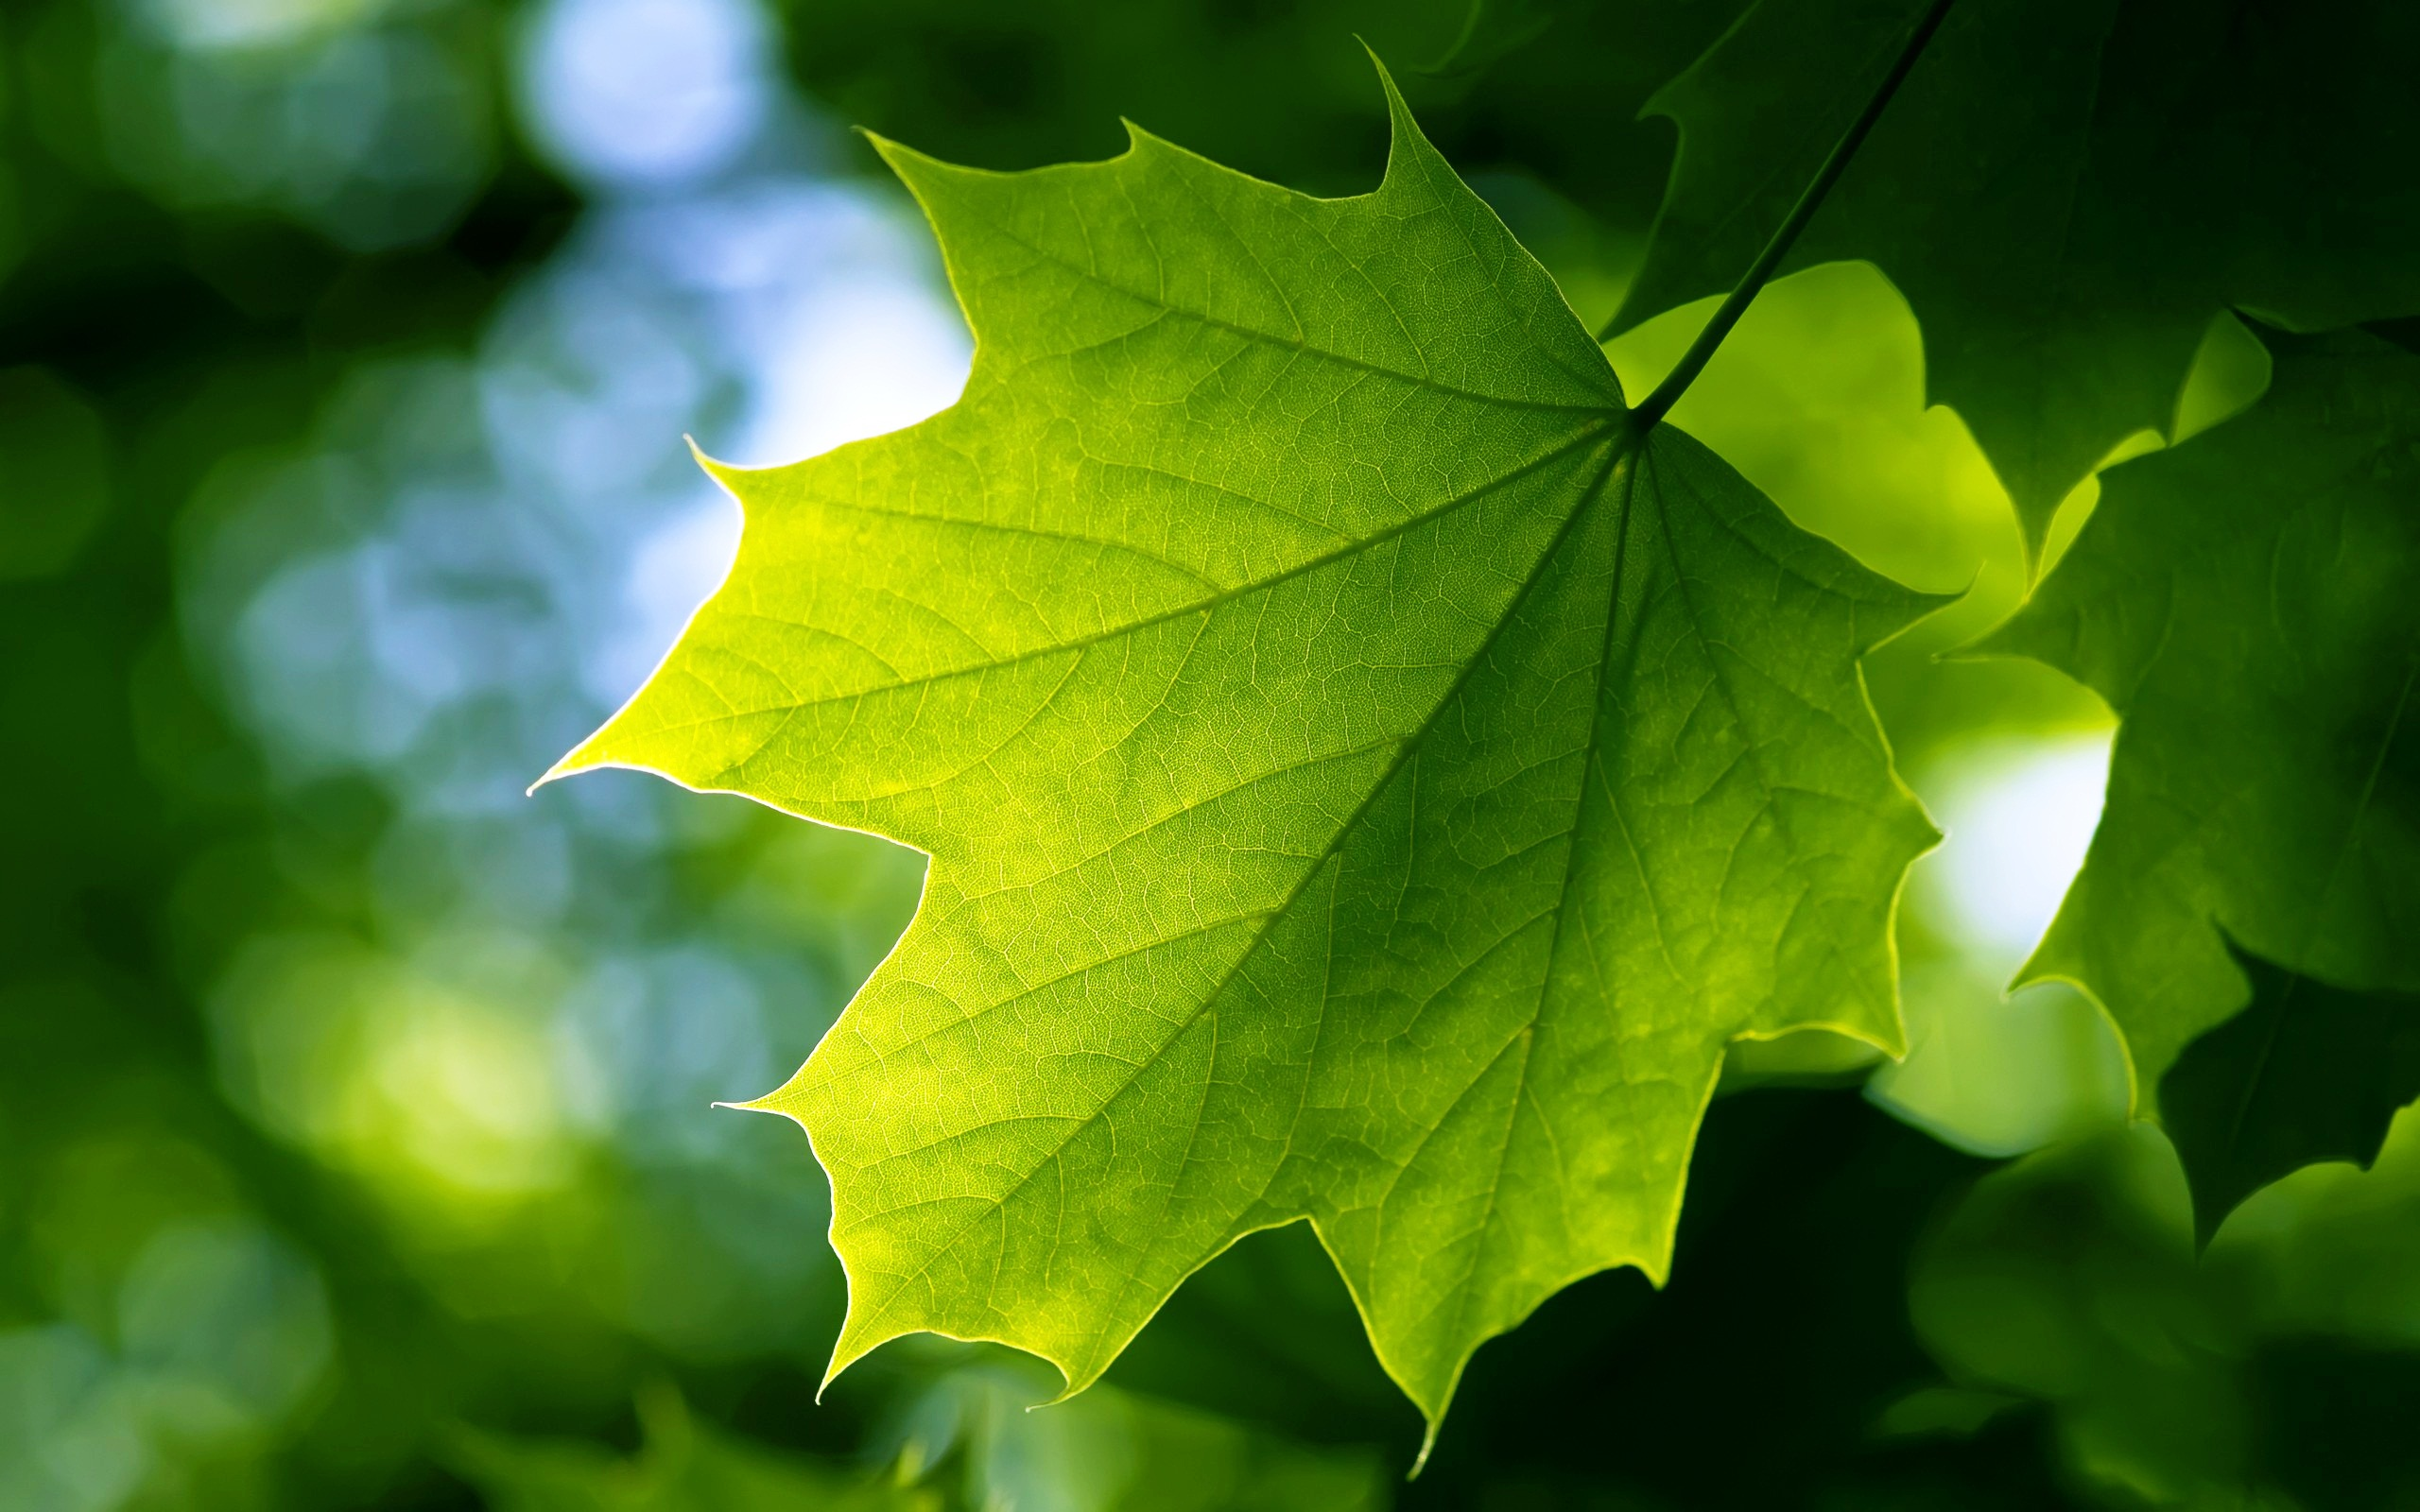 43 Green Leaf Wallpaper Hd On Wallpapersafari